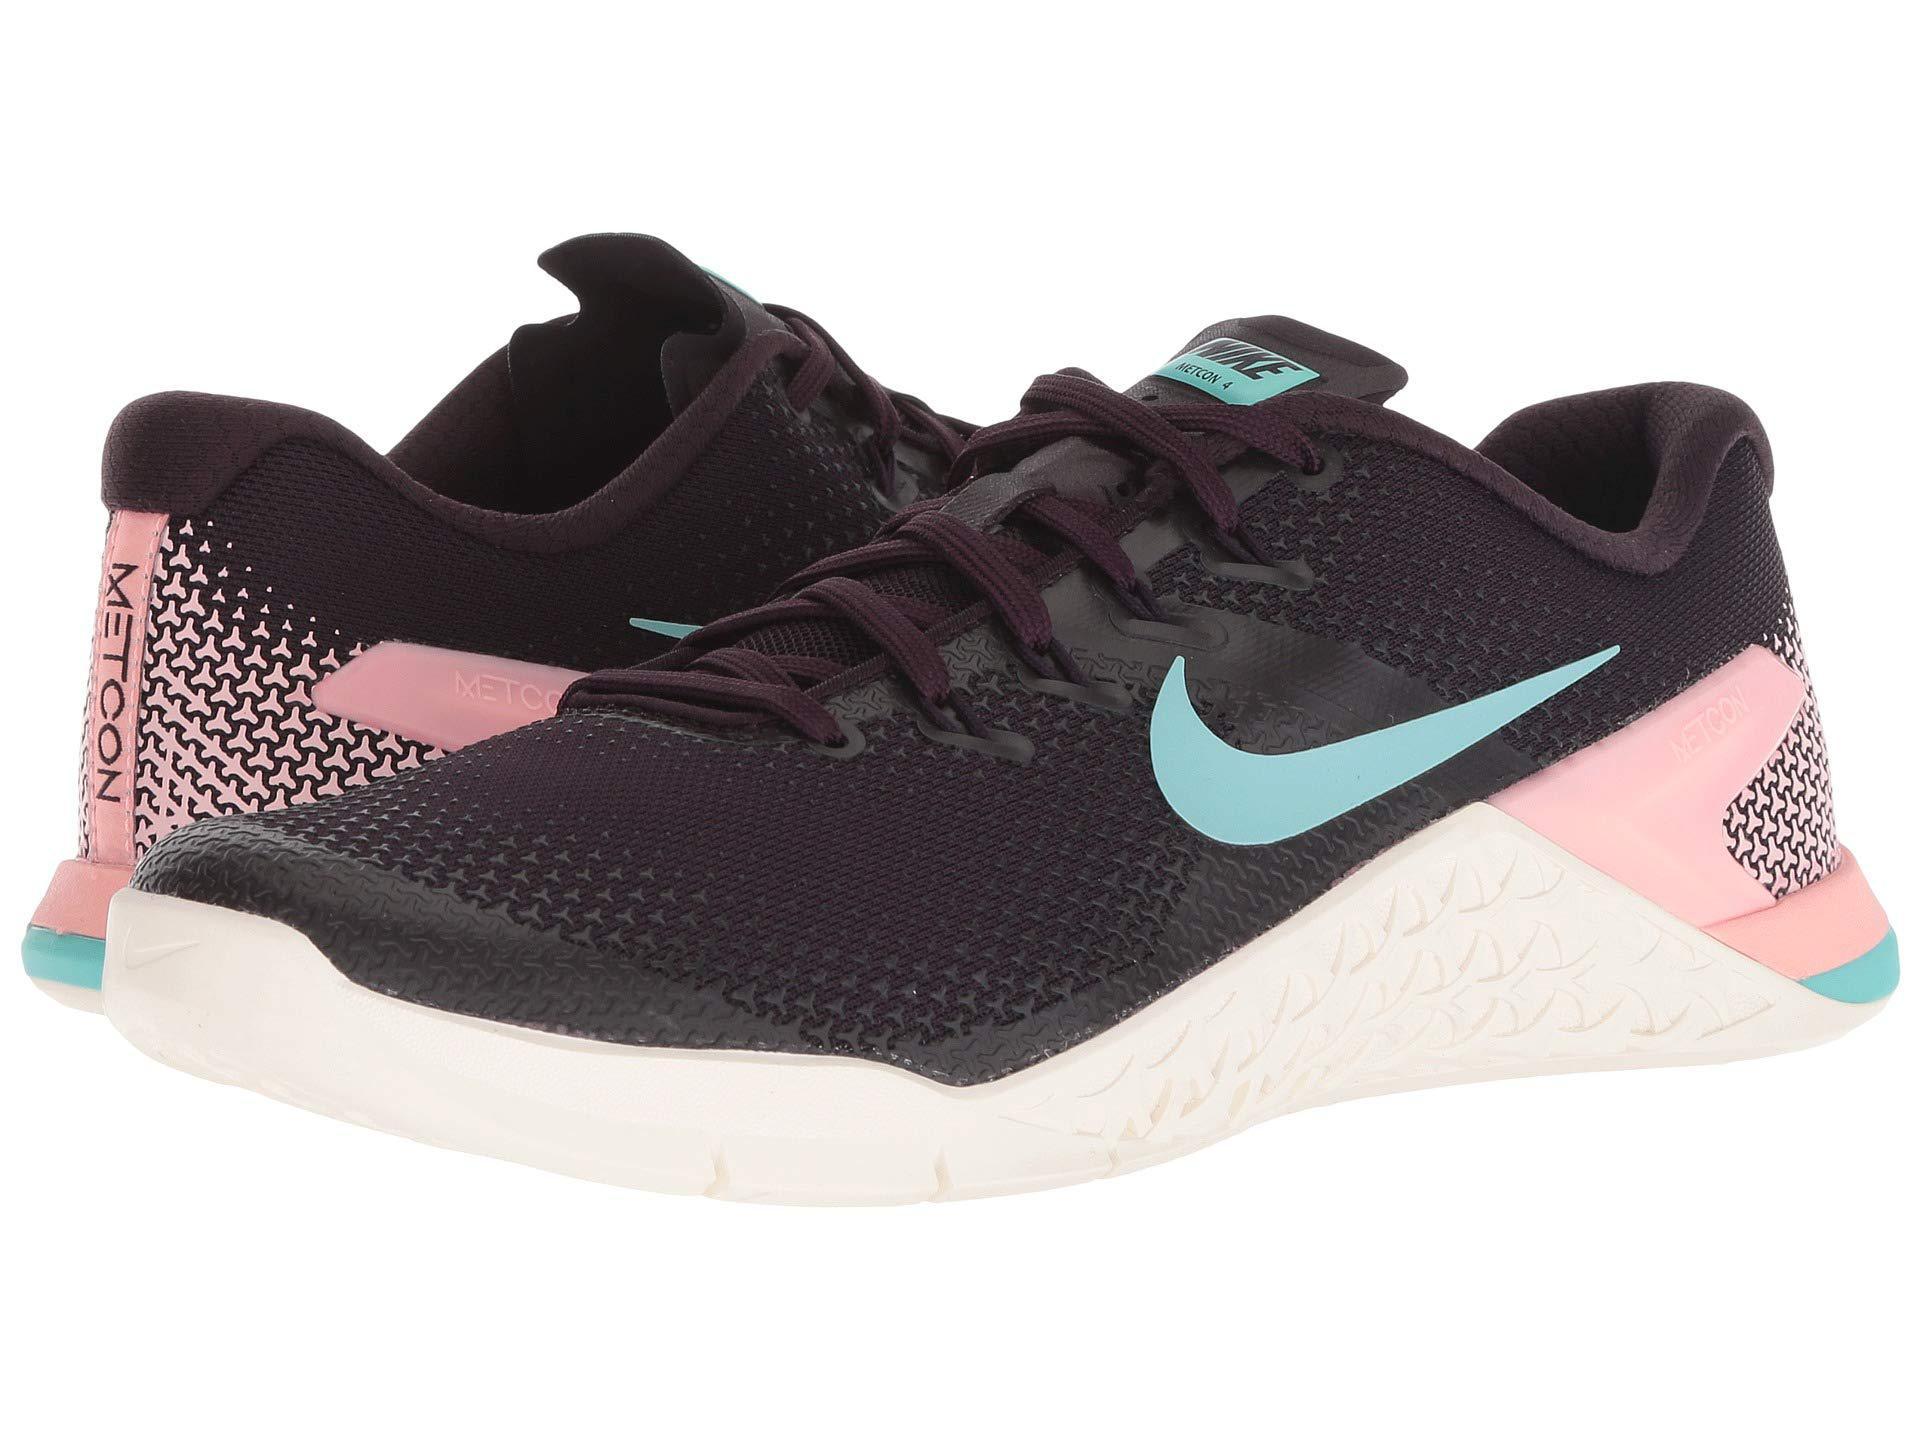 brand new 69473 d79bf Lyst - Nike Metcon 4 (black metallic Silver white volt Glow) Women s ...